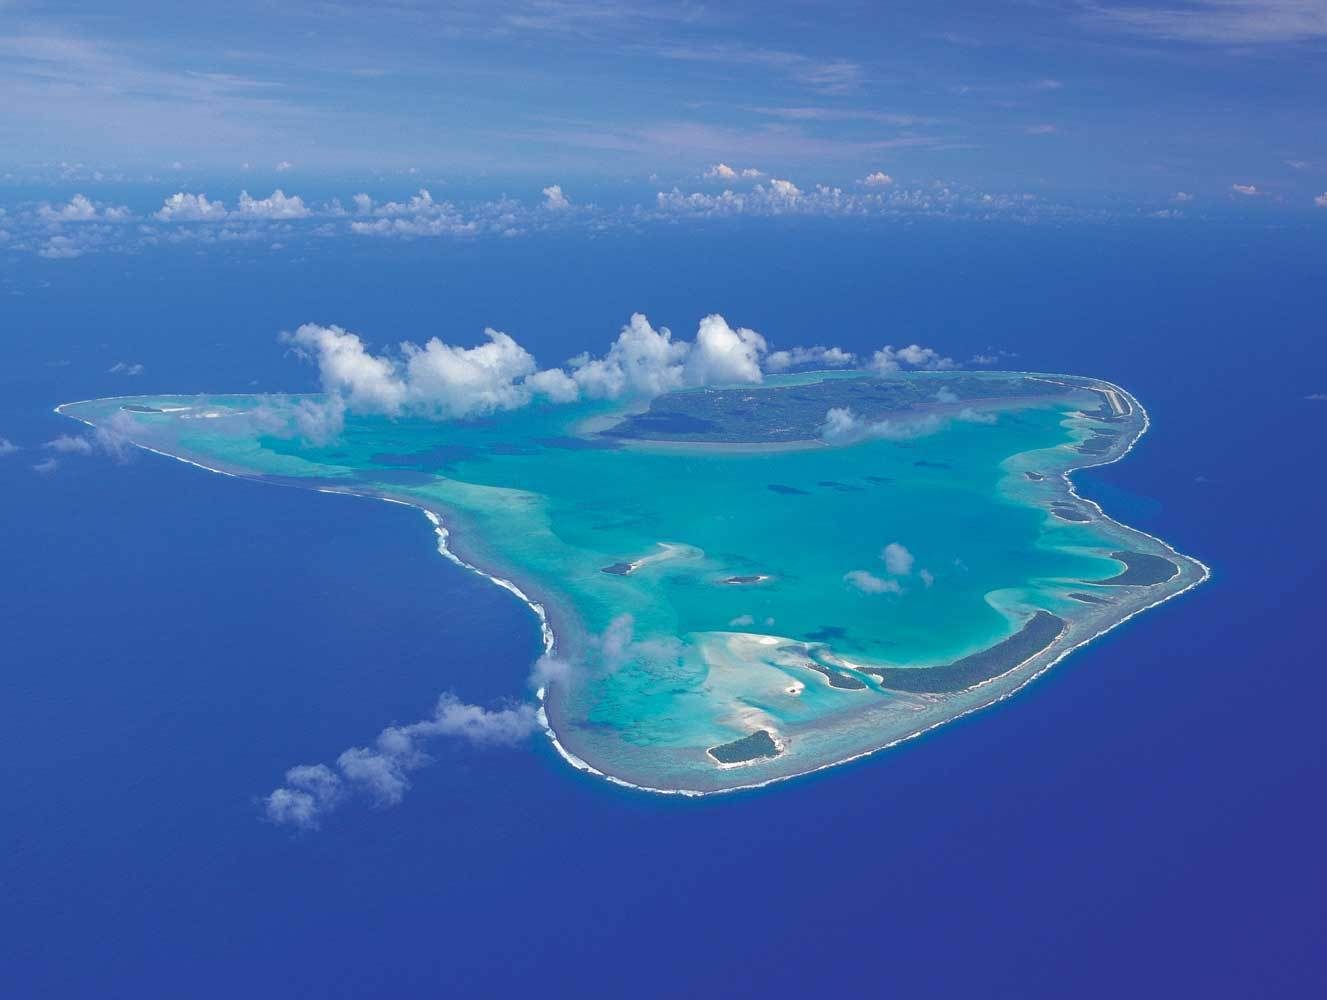 Download this The Cook Islands Aitutaki picture